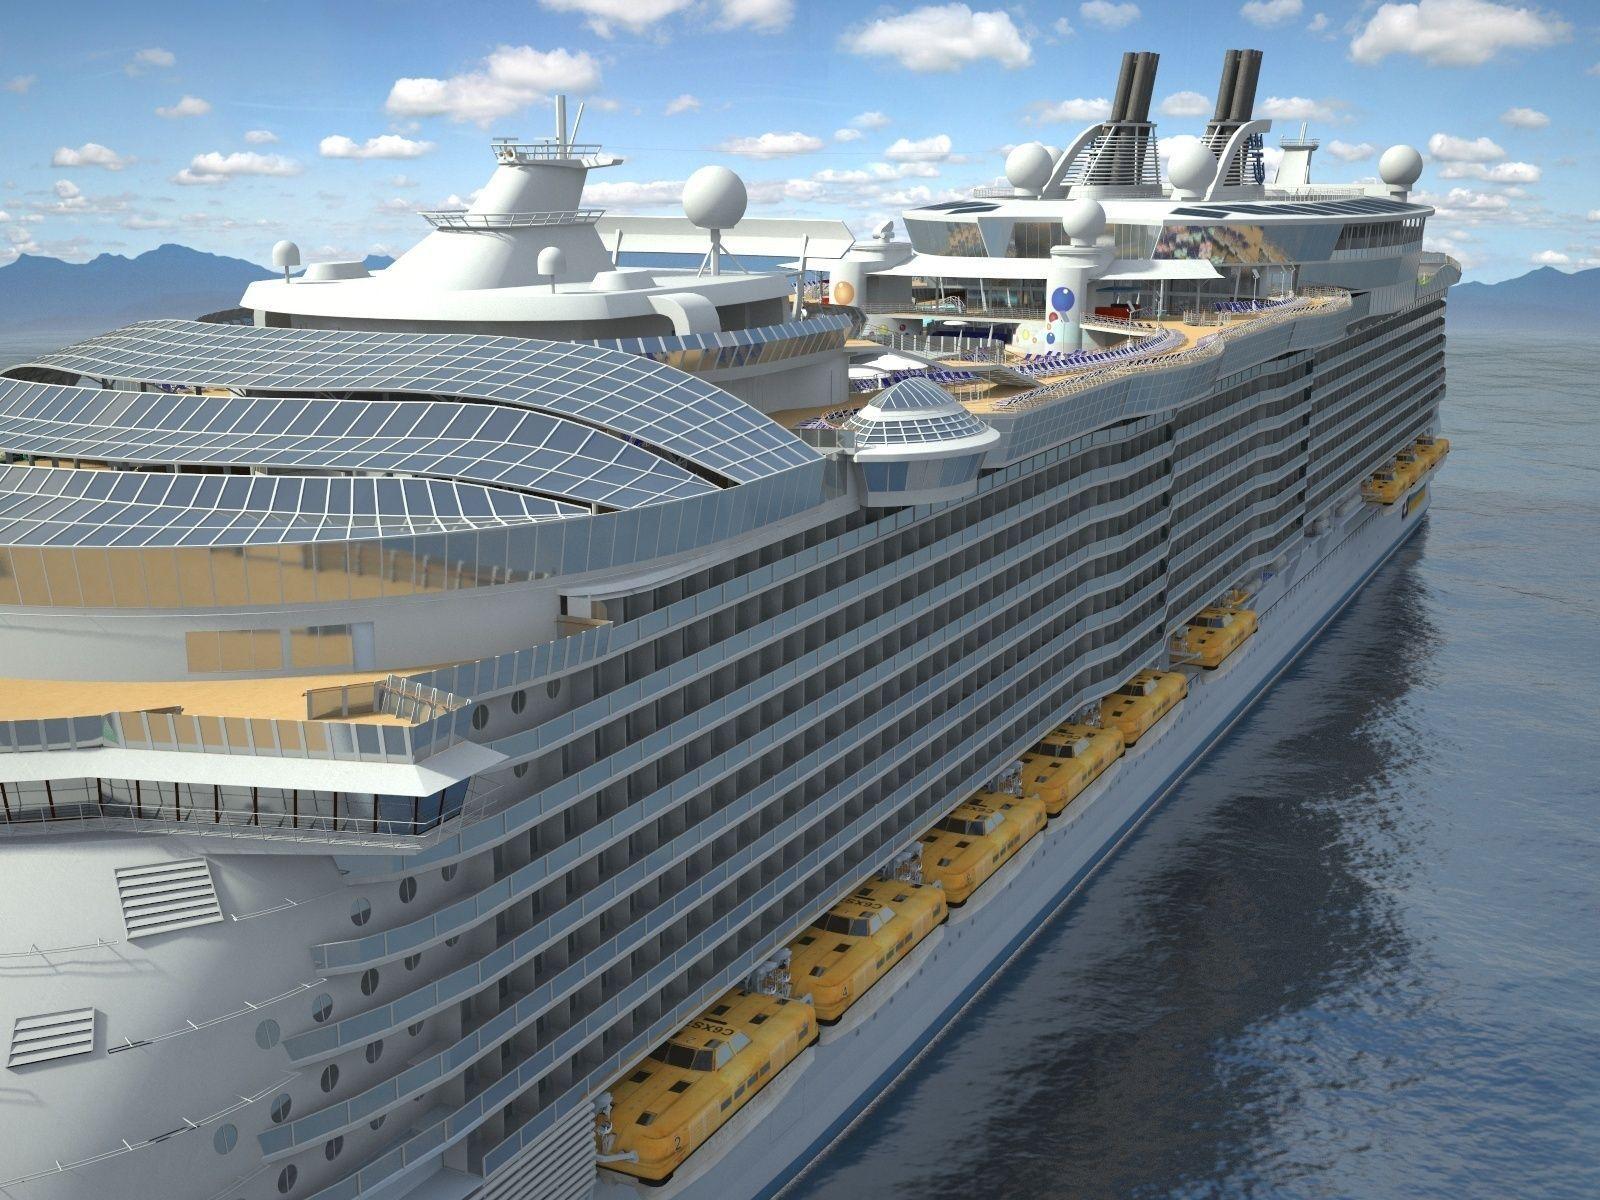 Oasis Of The Seas Cruise Ship 3D Model MAX OBJ 3DS FBX C4D